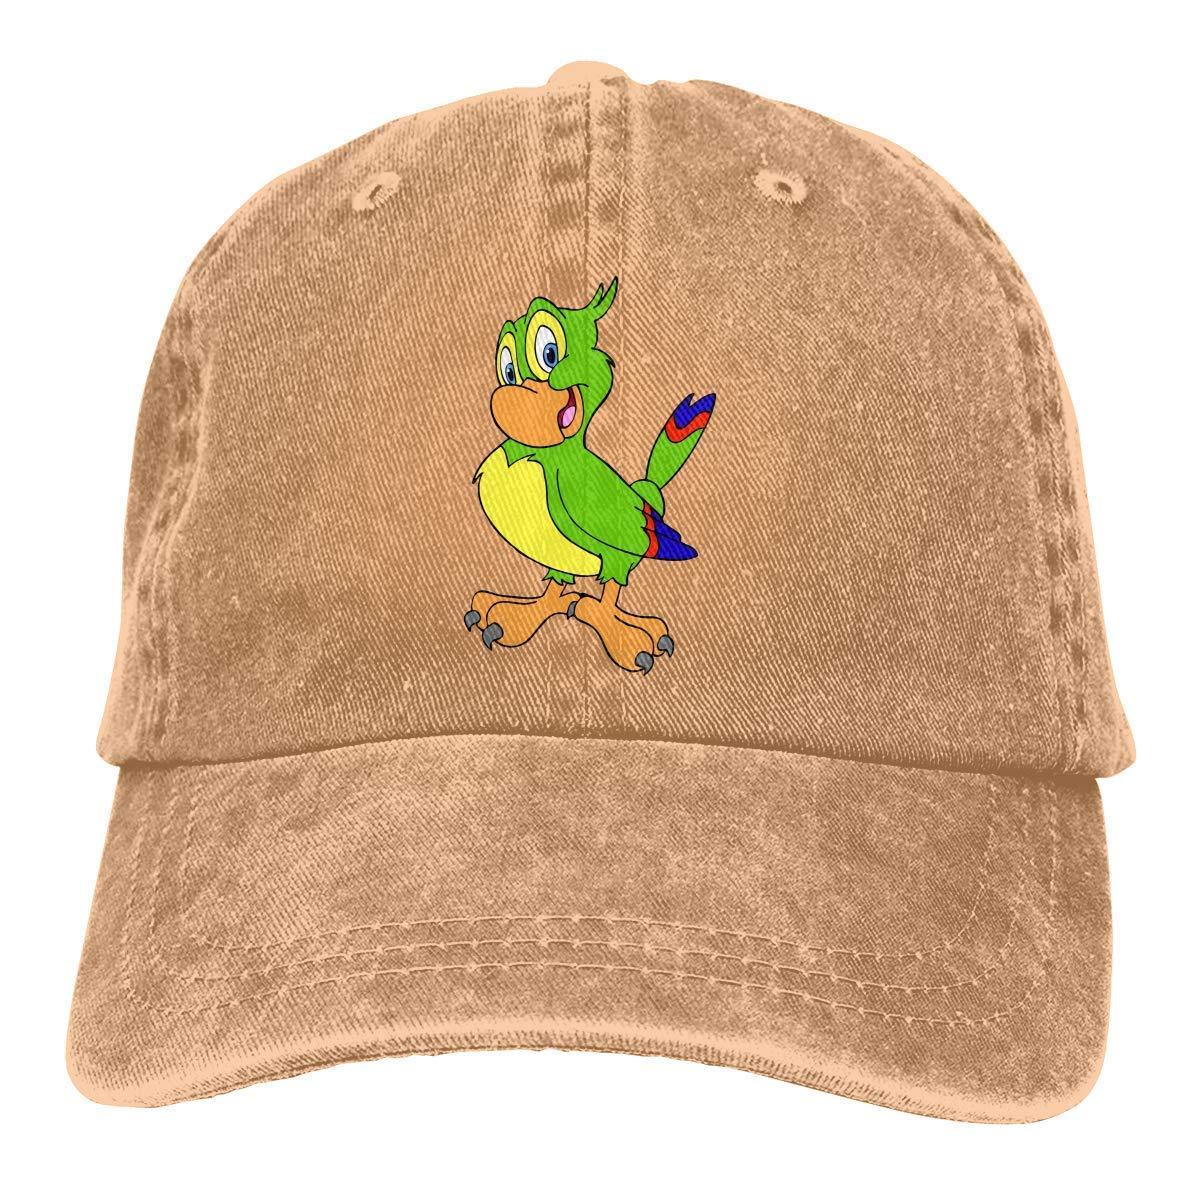 Unisex Cartoon Cockatiel Vintage Washed Dad Hat Fashion Adjustable Baseball Cap